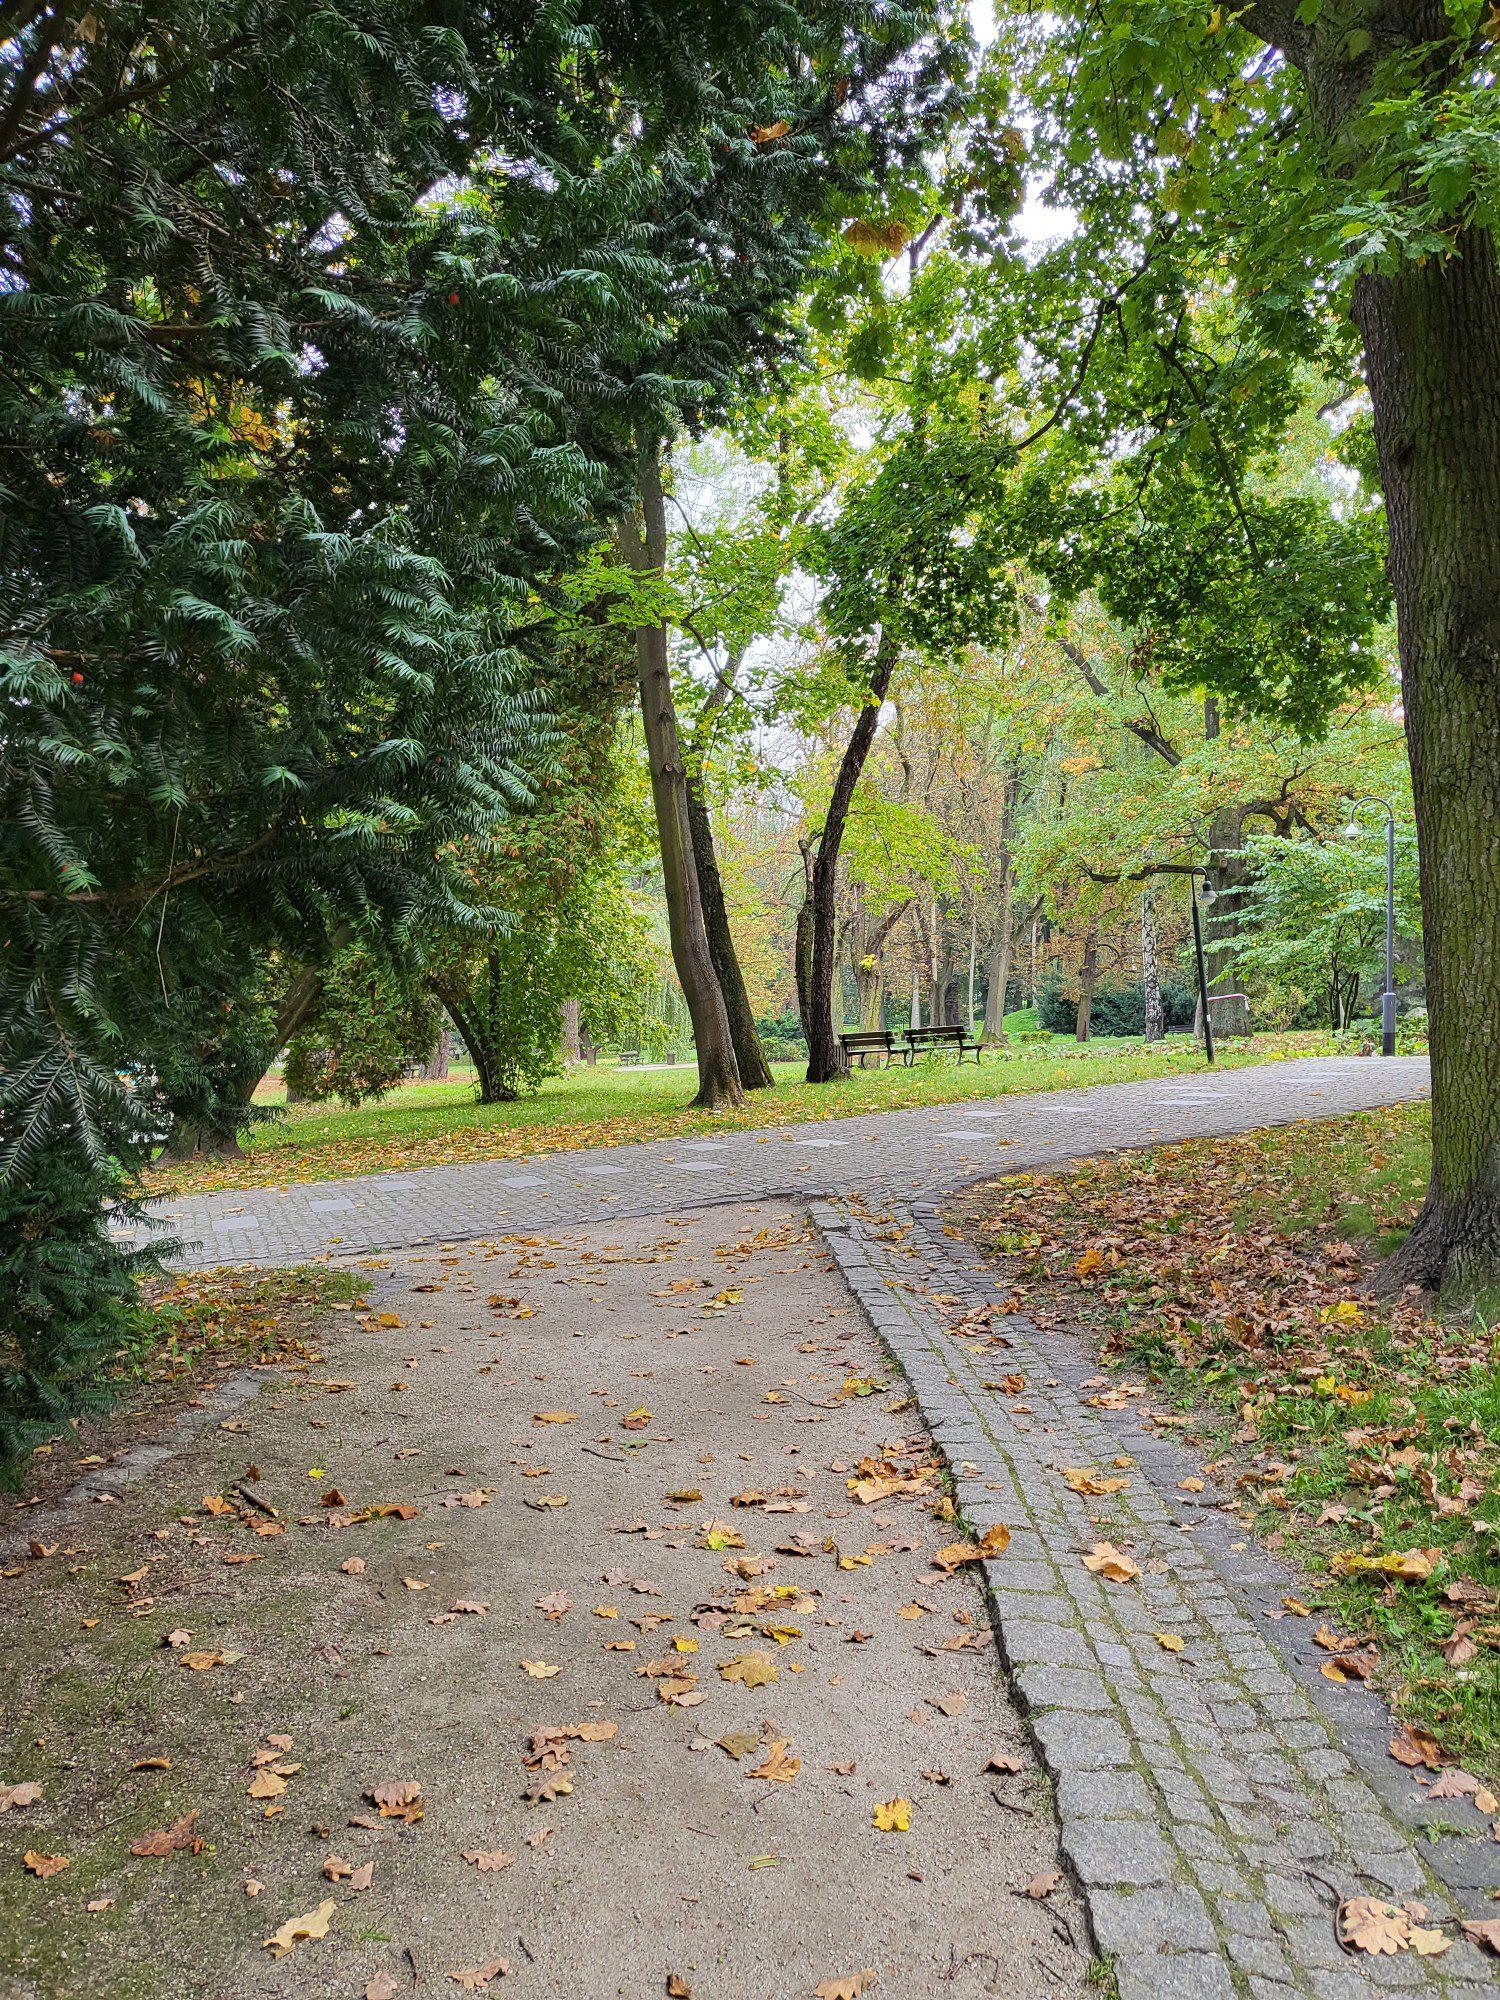 zdjęcie parku aparatem samsunga